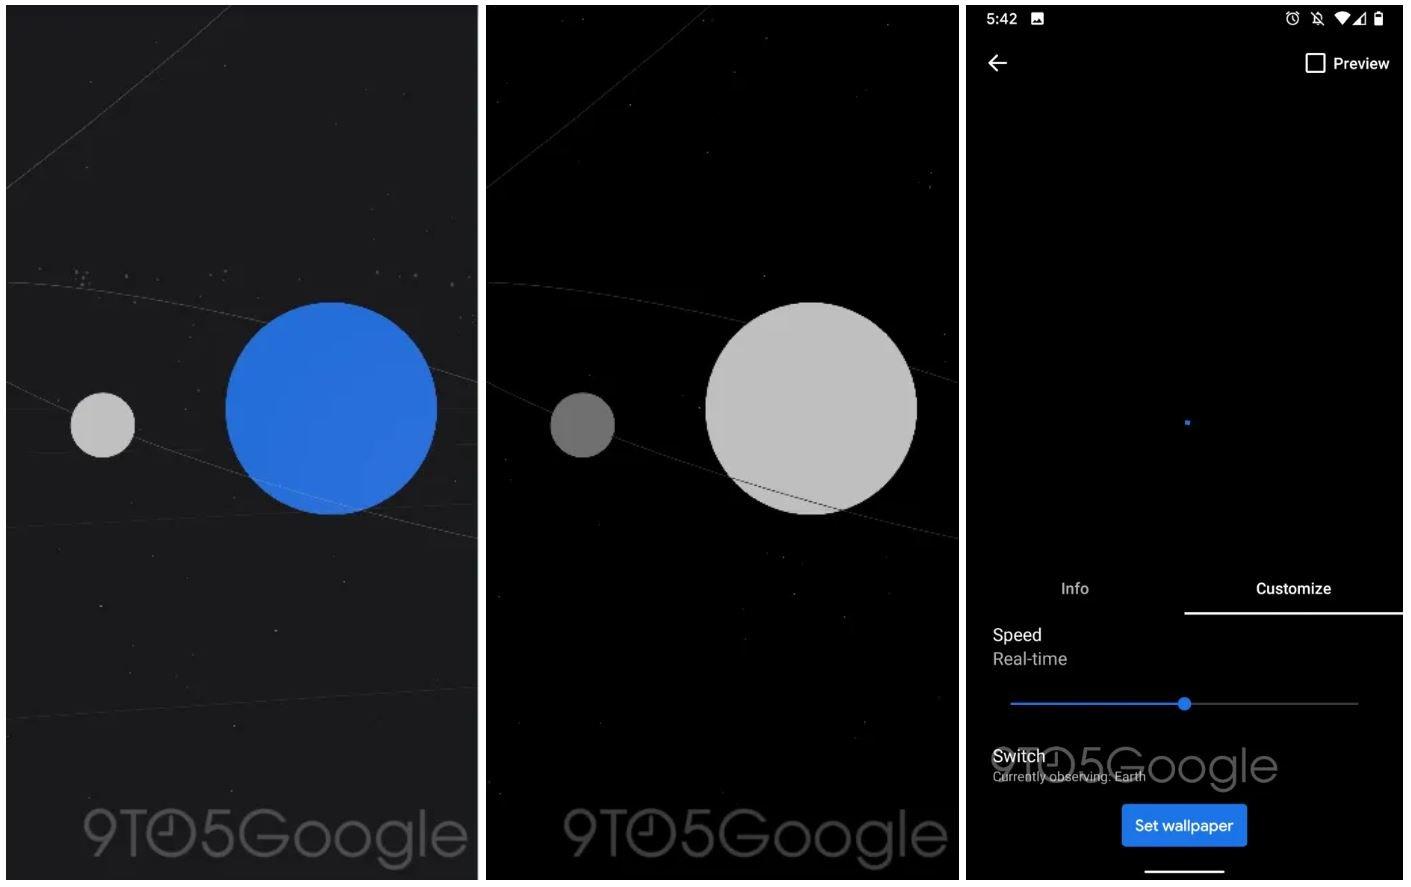 pixel 4 live wallpaper sun planets